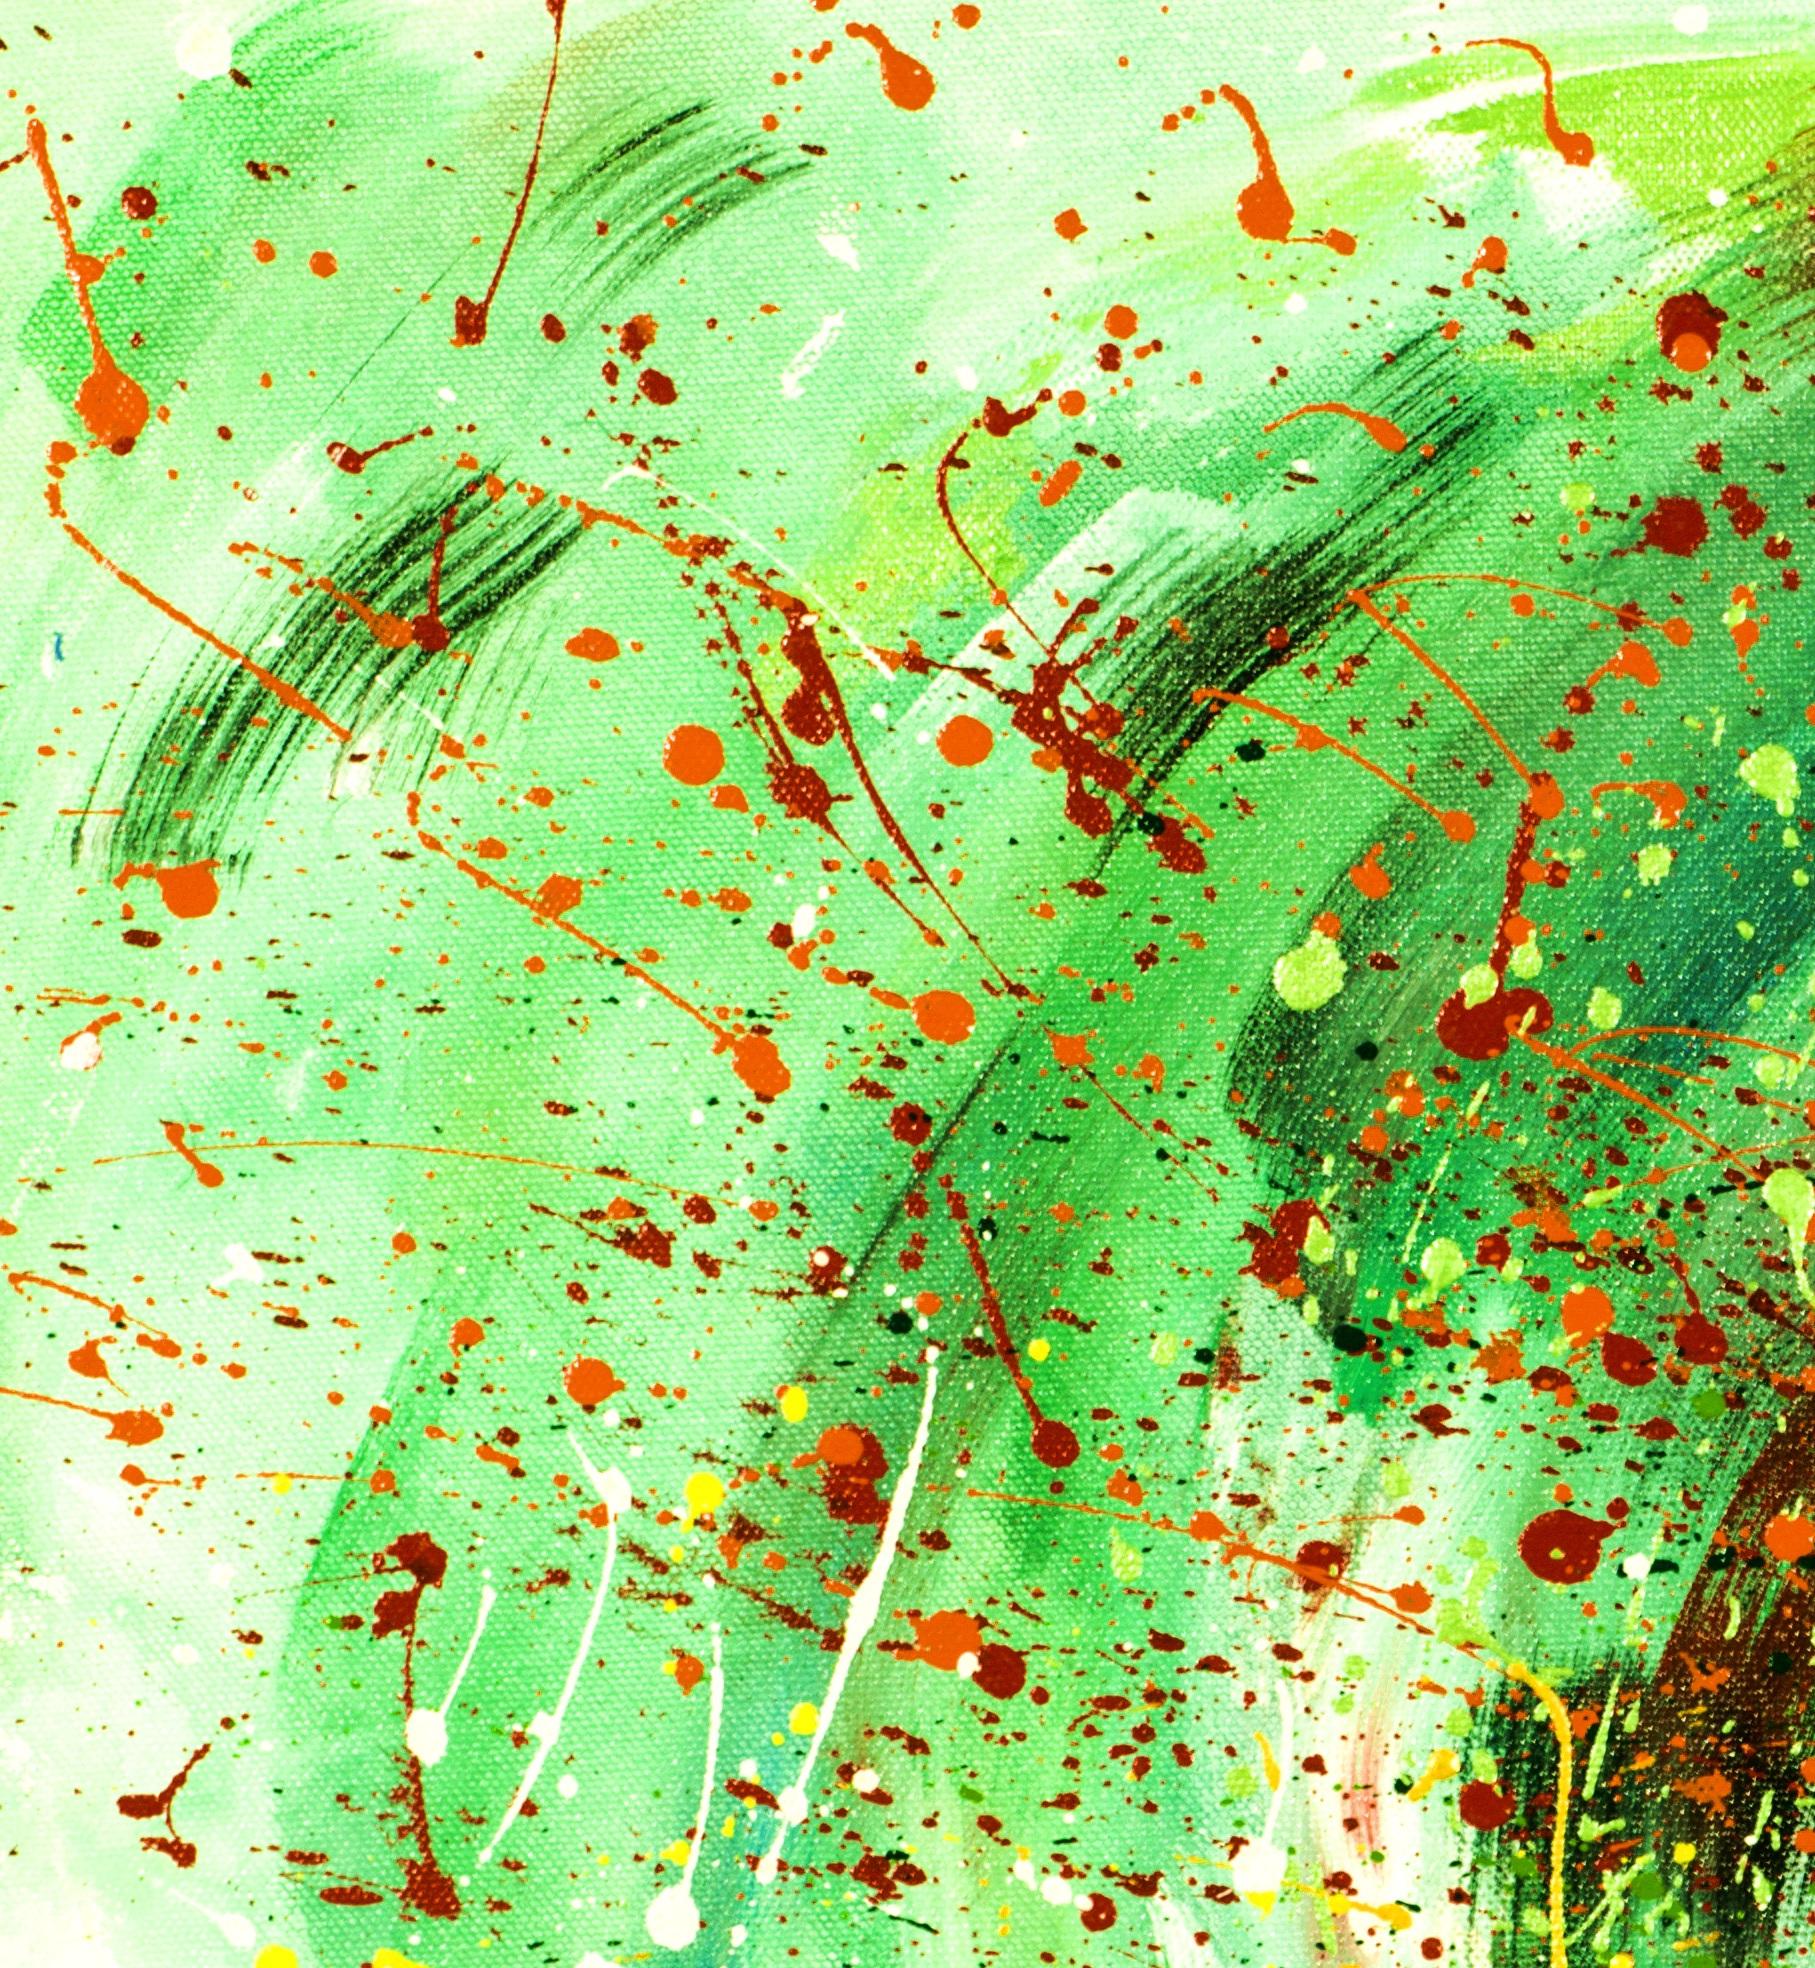 canvas-1905725_1